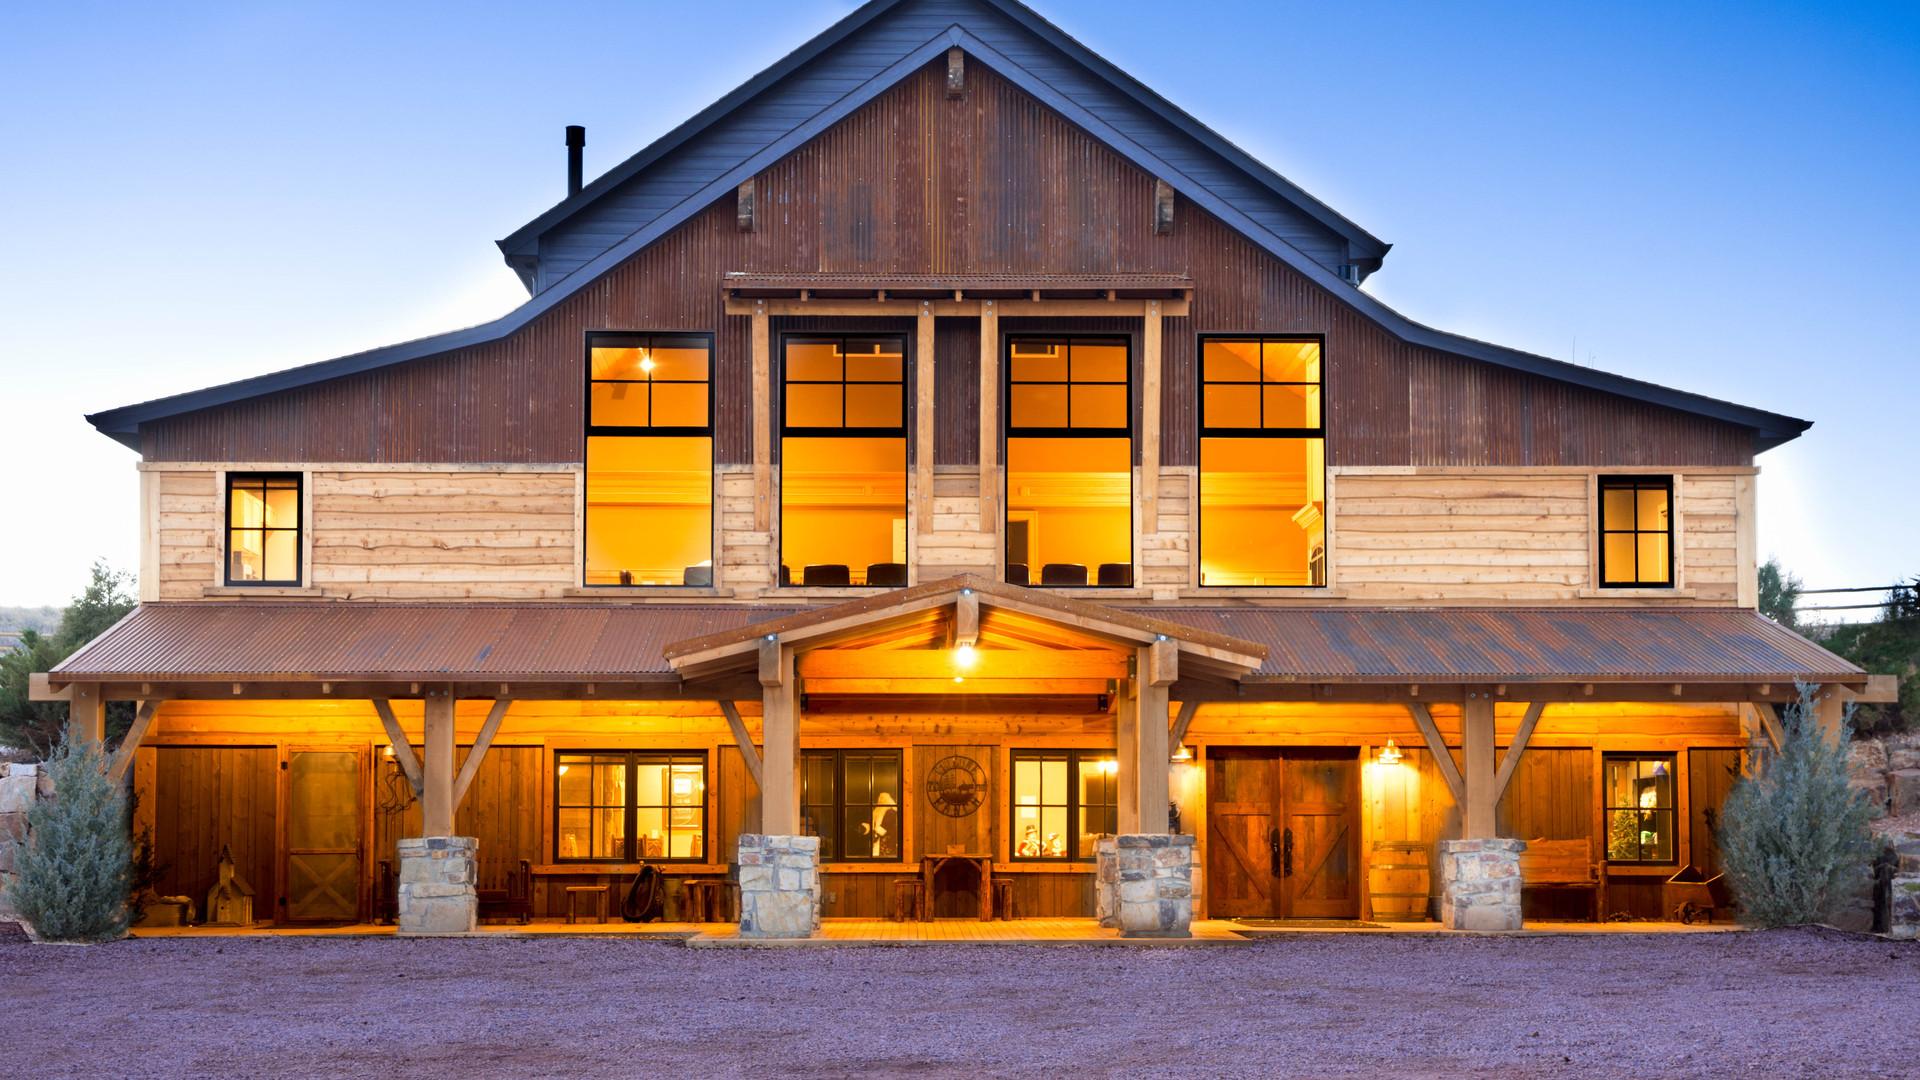 hokey pokey ranch